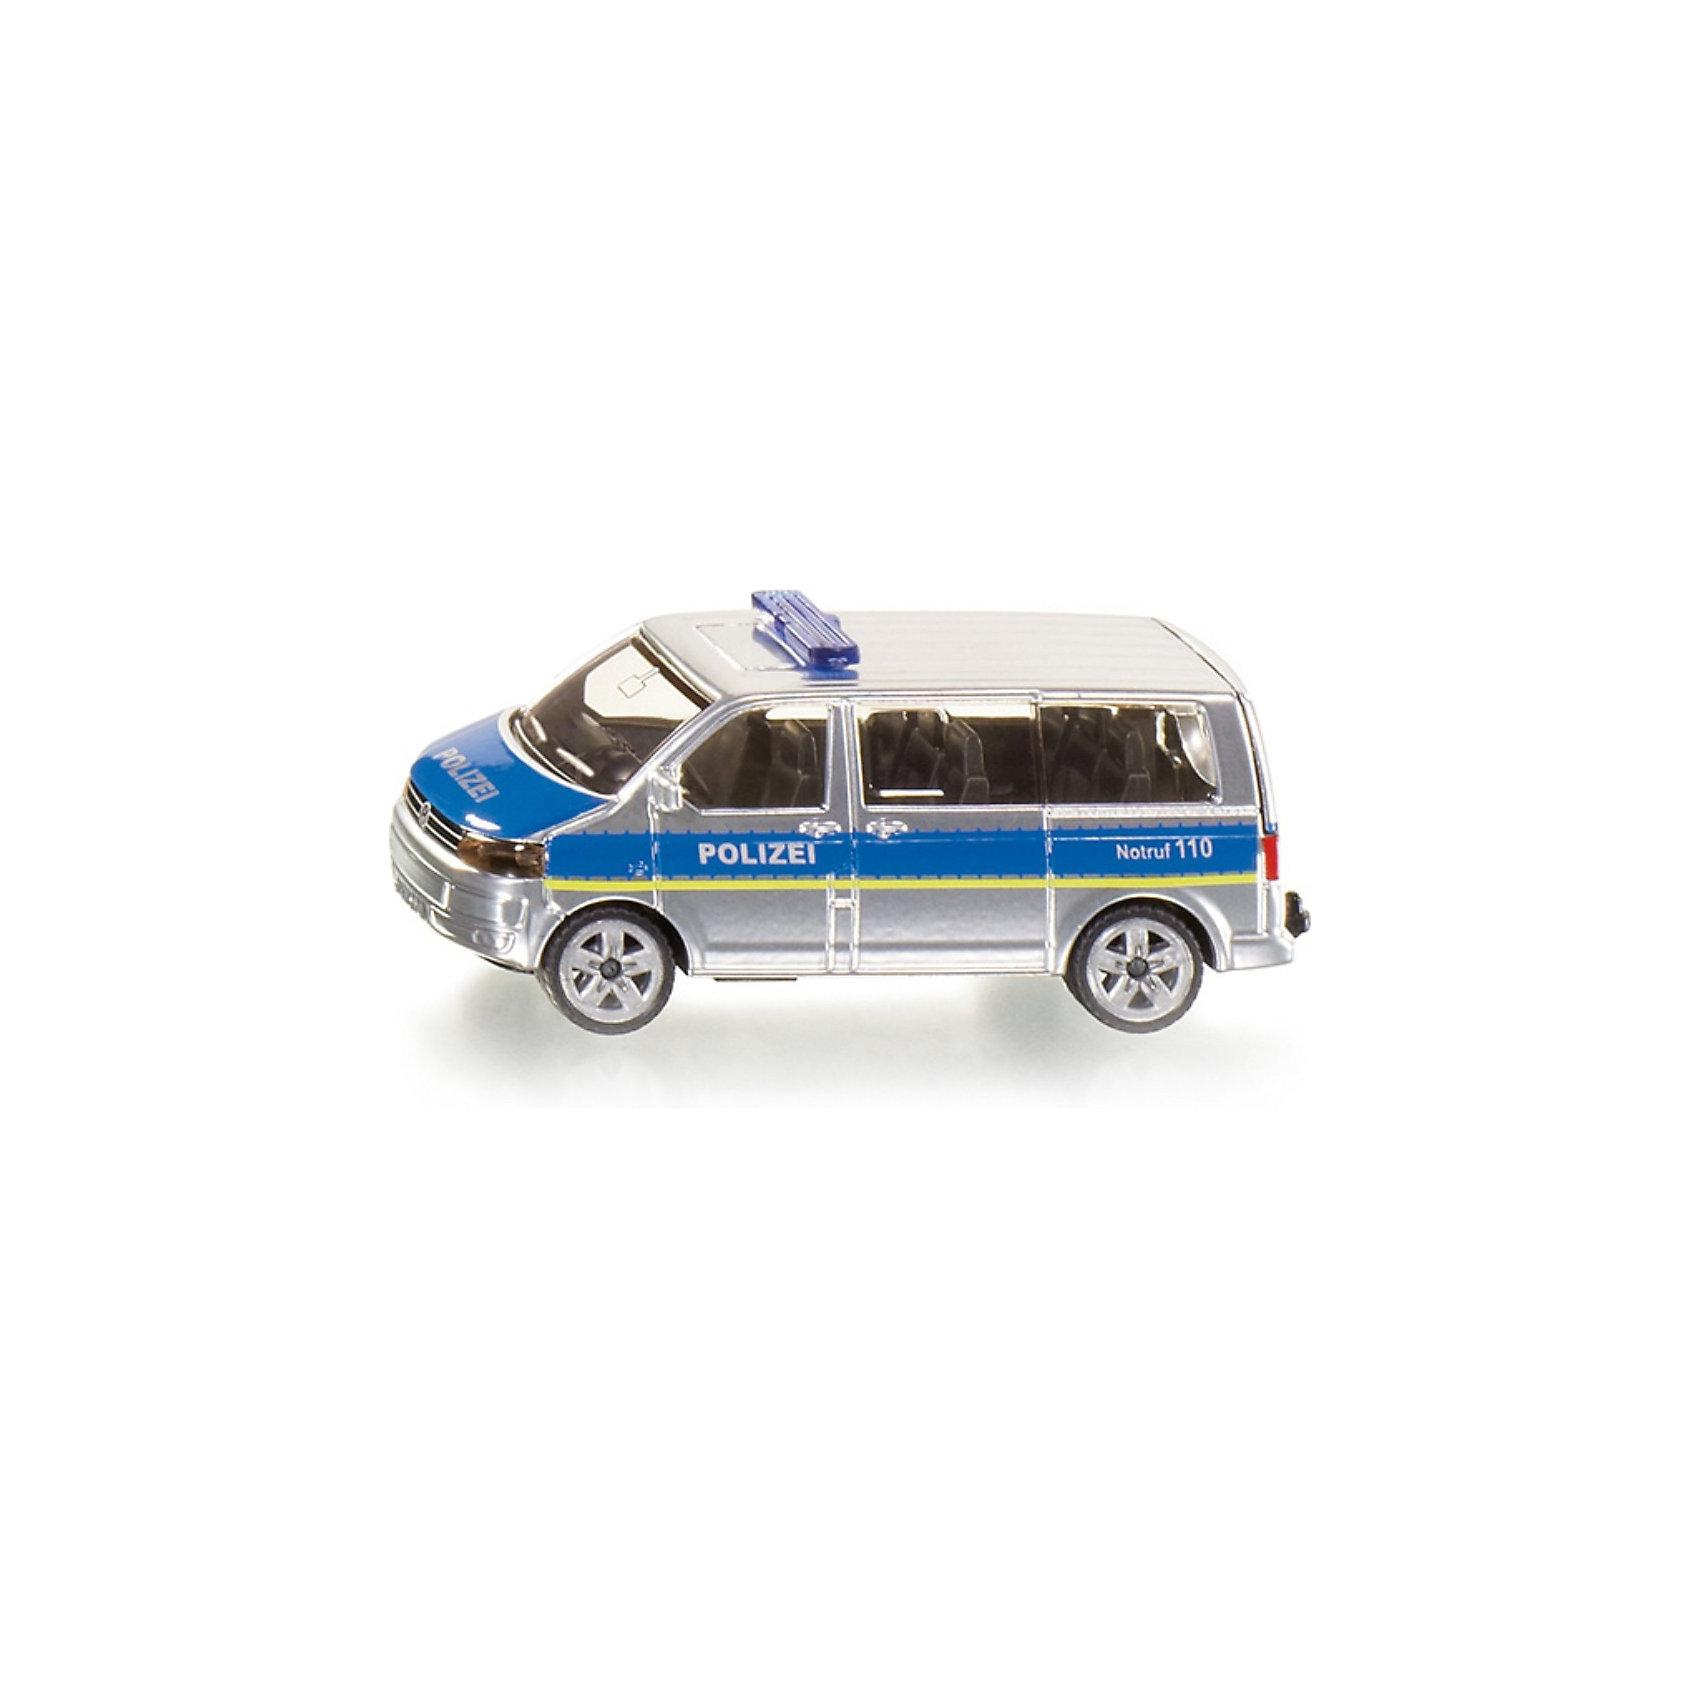 SIKU 1350 Полицейский микроавтобус